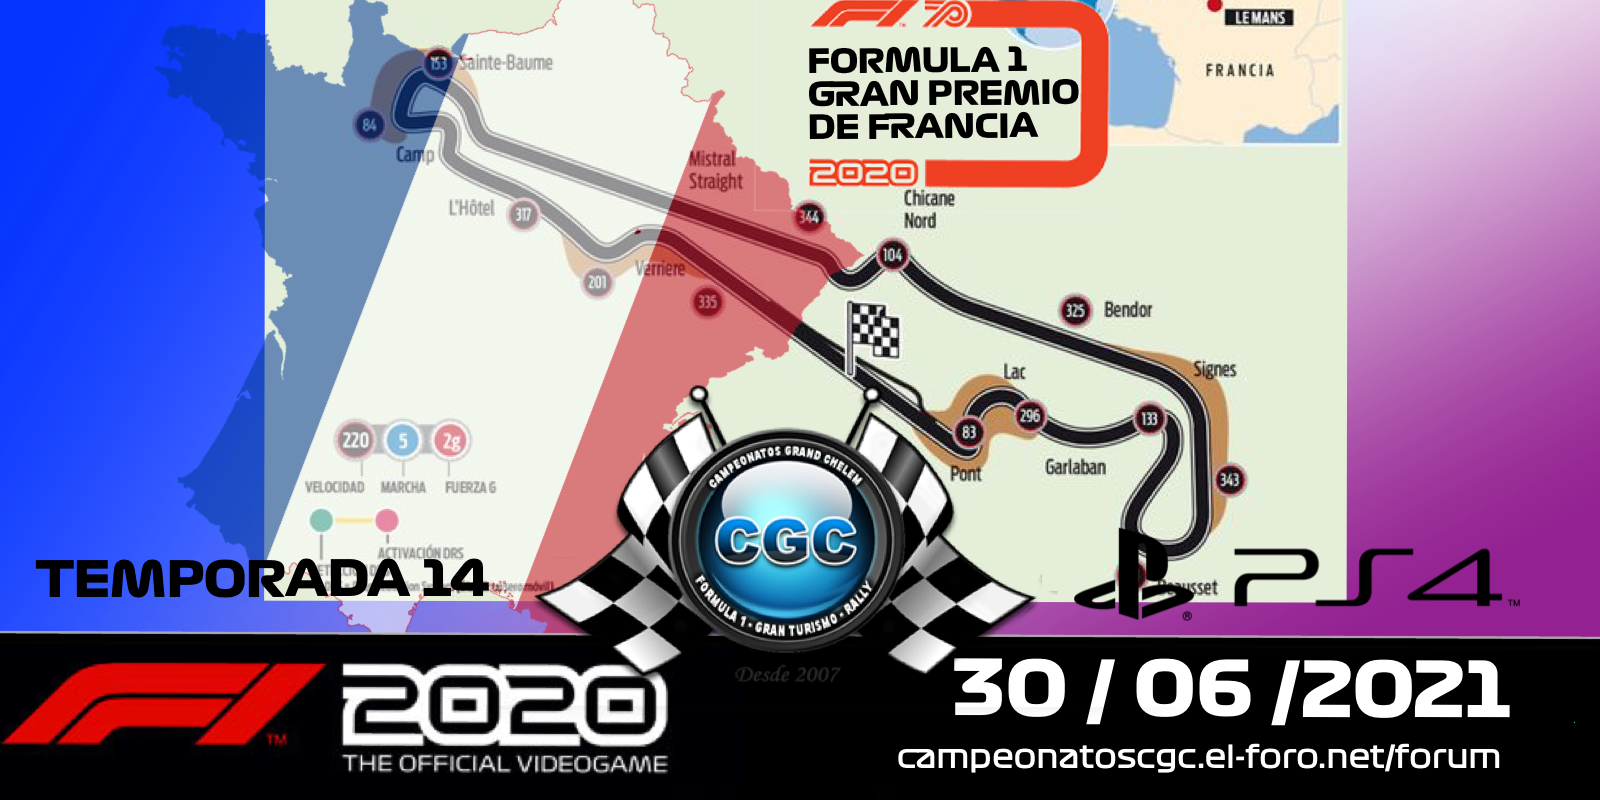 13 - GP de FRANCIA 30/06/2021 NlDgpZG